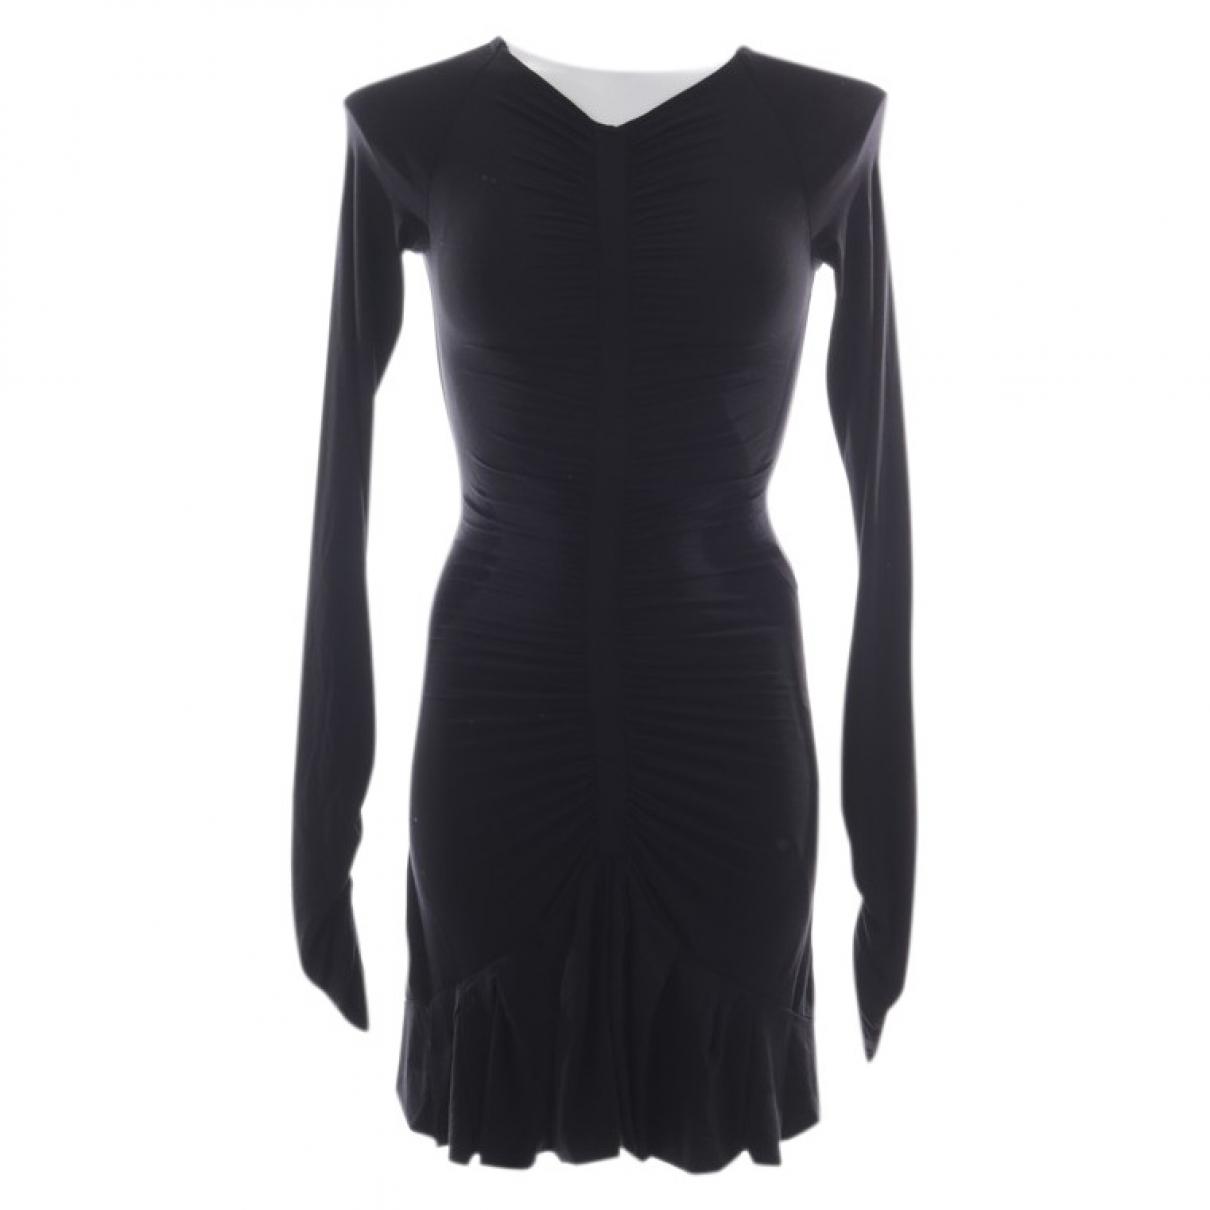 Pierre Balmain \N Black dress for Women 36 FR